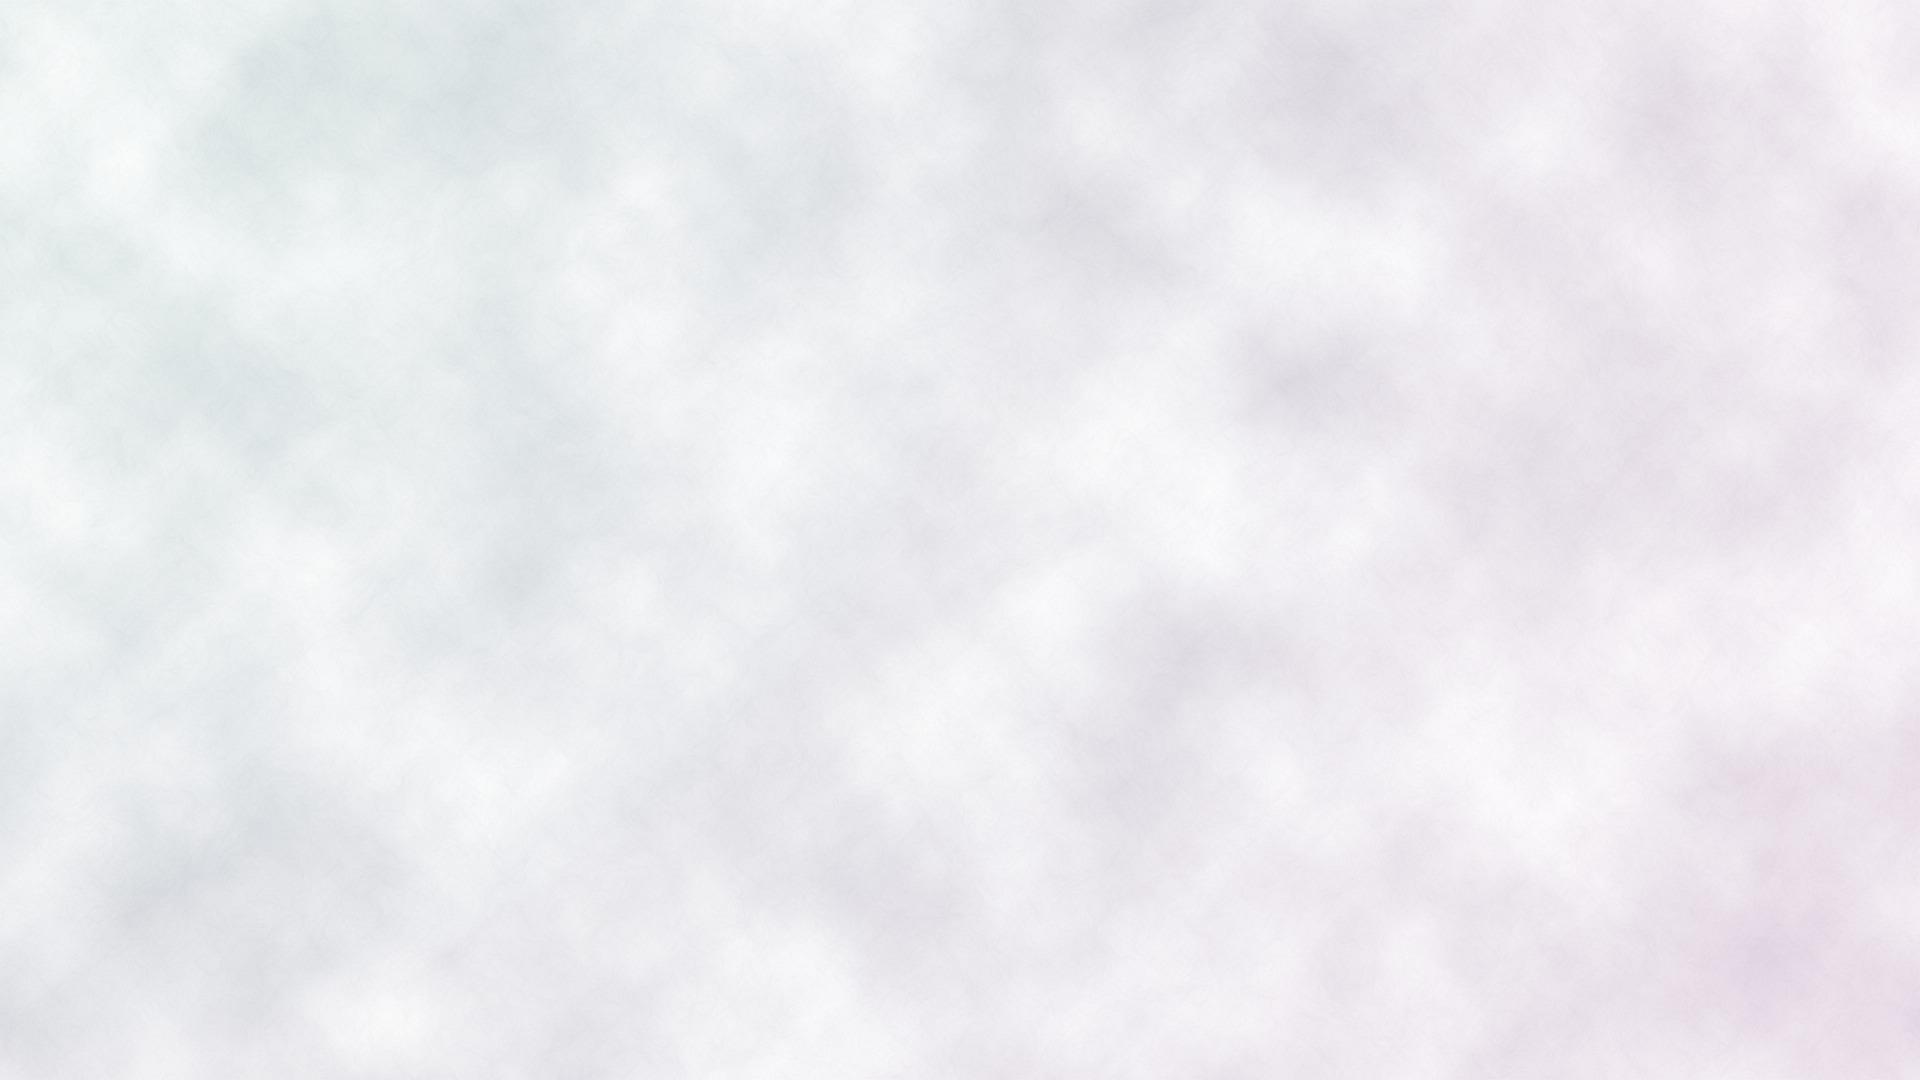 和紙風 壁紙背景画像_washi4